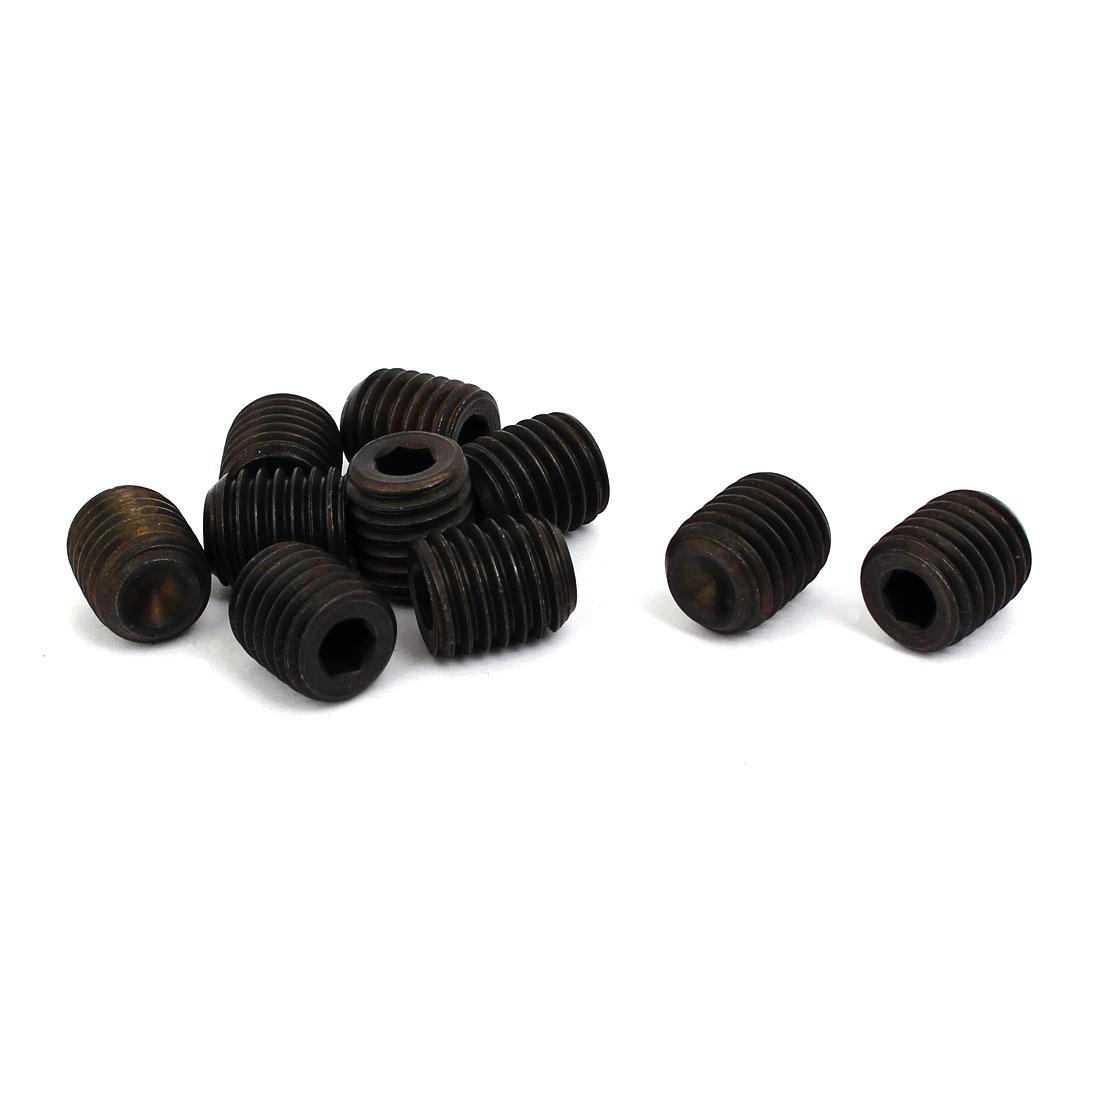 M14 Dia 10.9 Grade 16mm Long Cup Point Head Hex Socket Grub Screw DIN916 10pcs